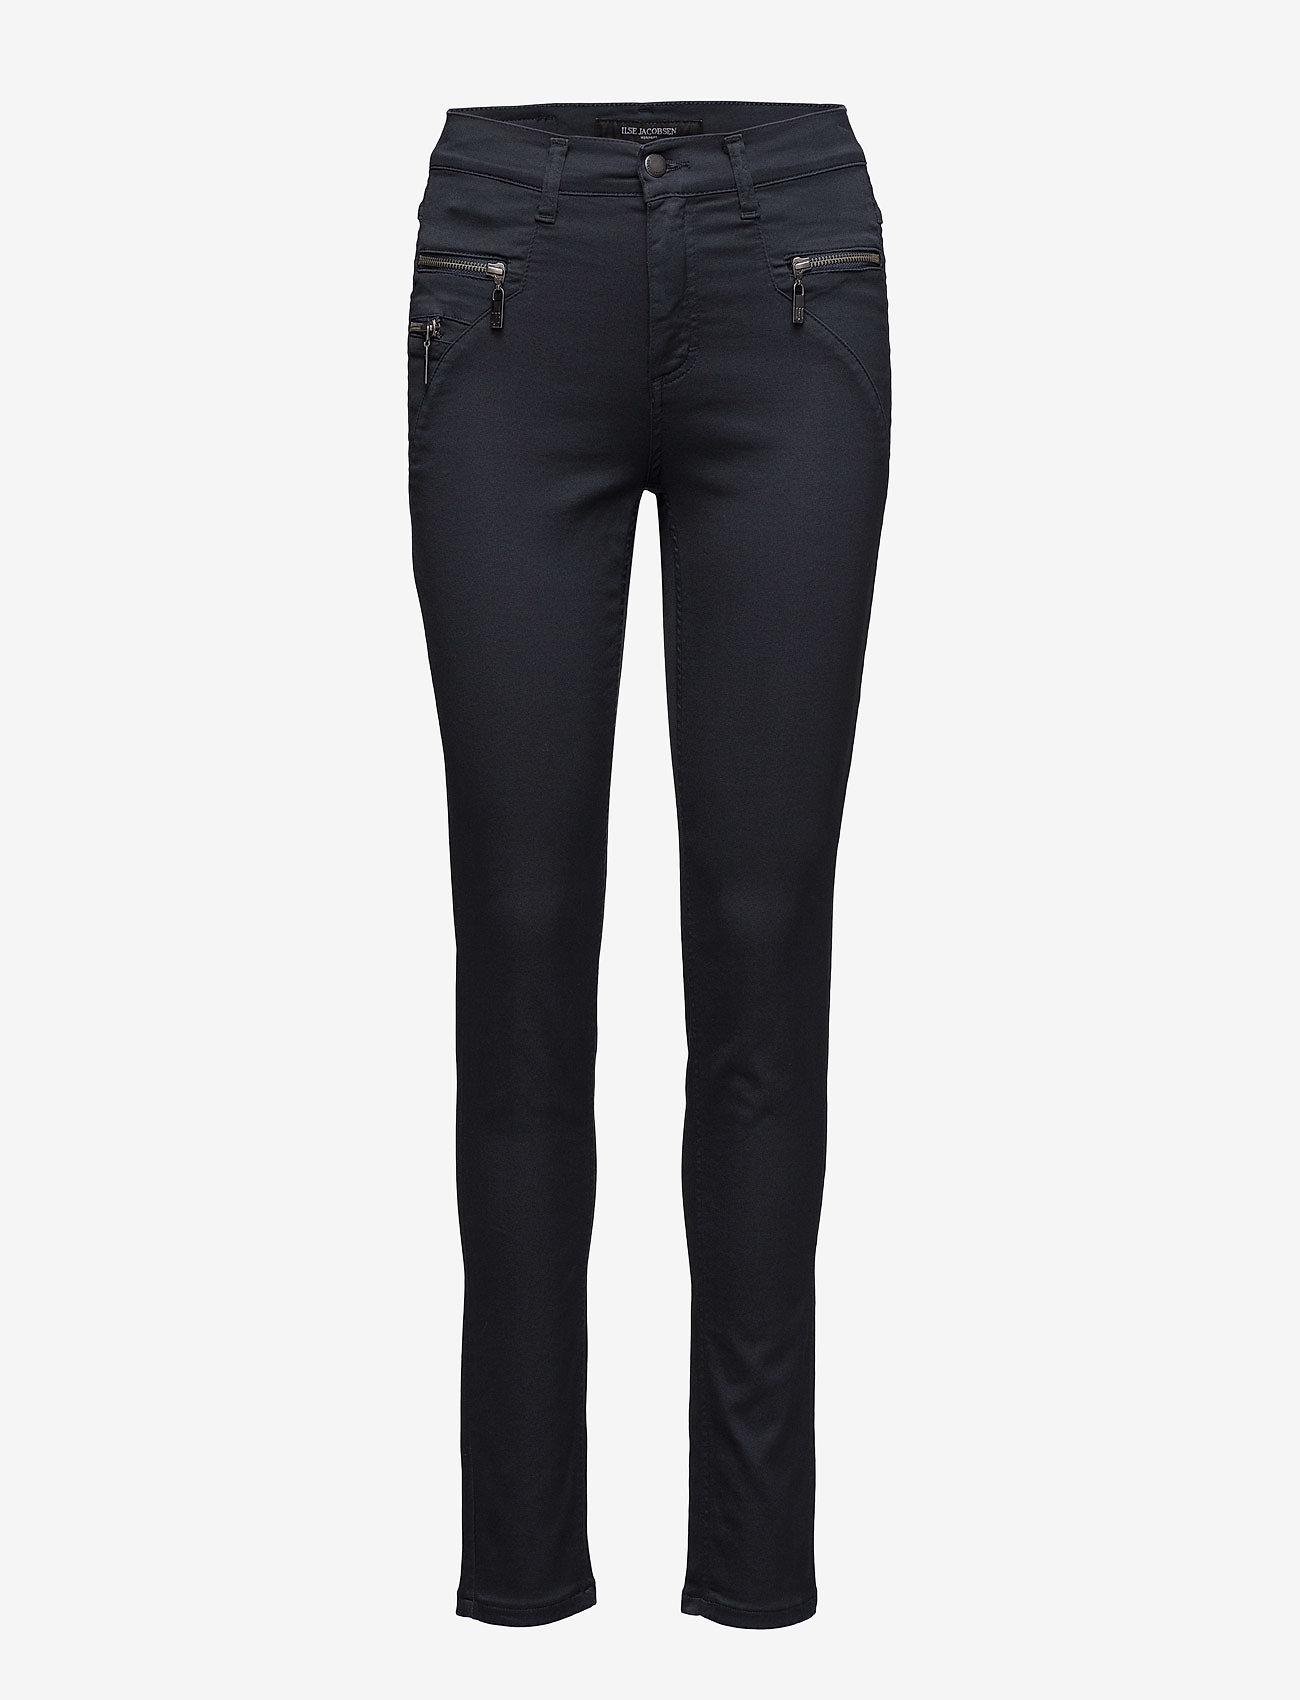 Ilse Jacobsen - TROUSERS - broeken med skinny fit - dark indigo - 0